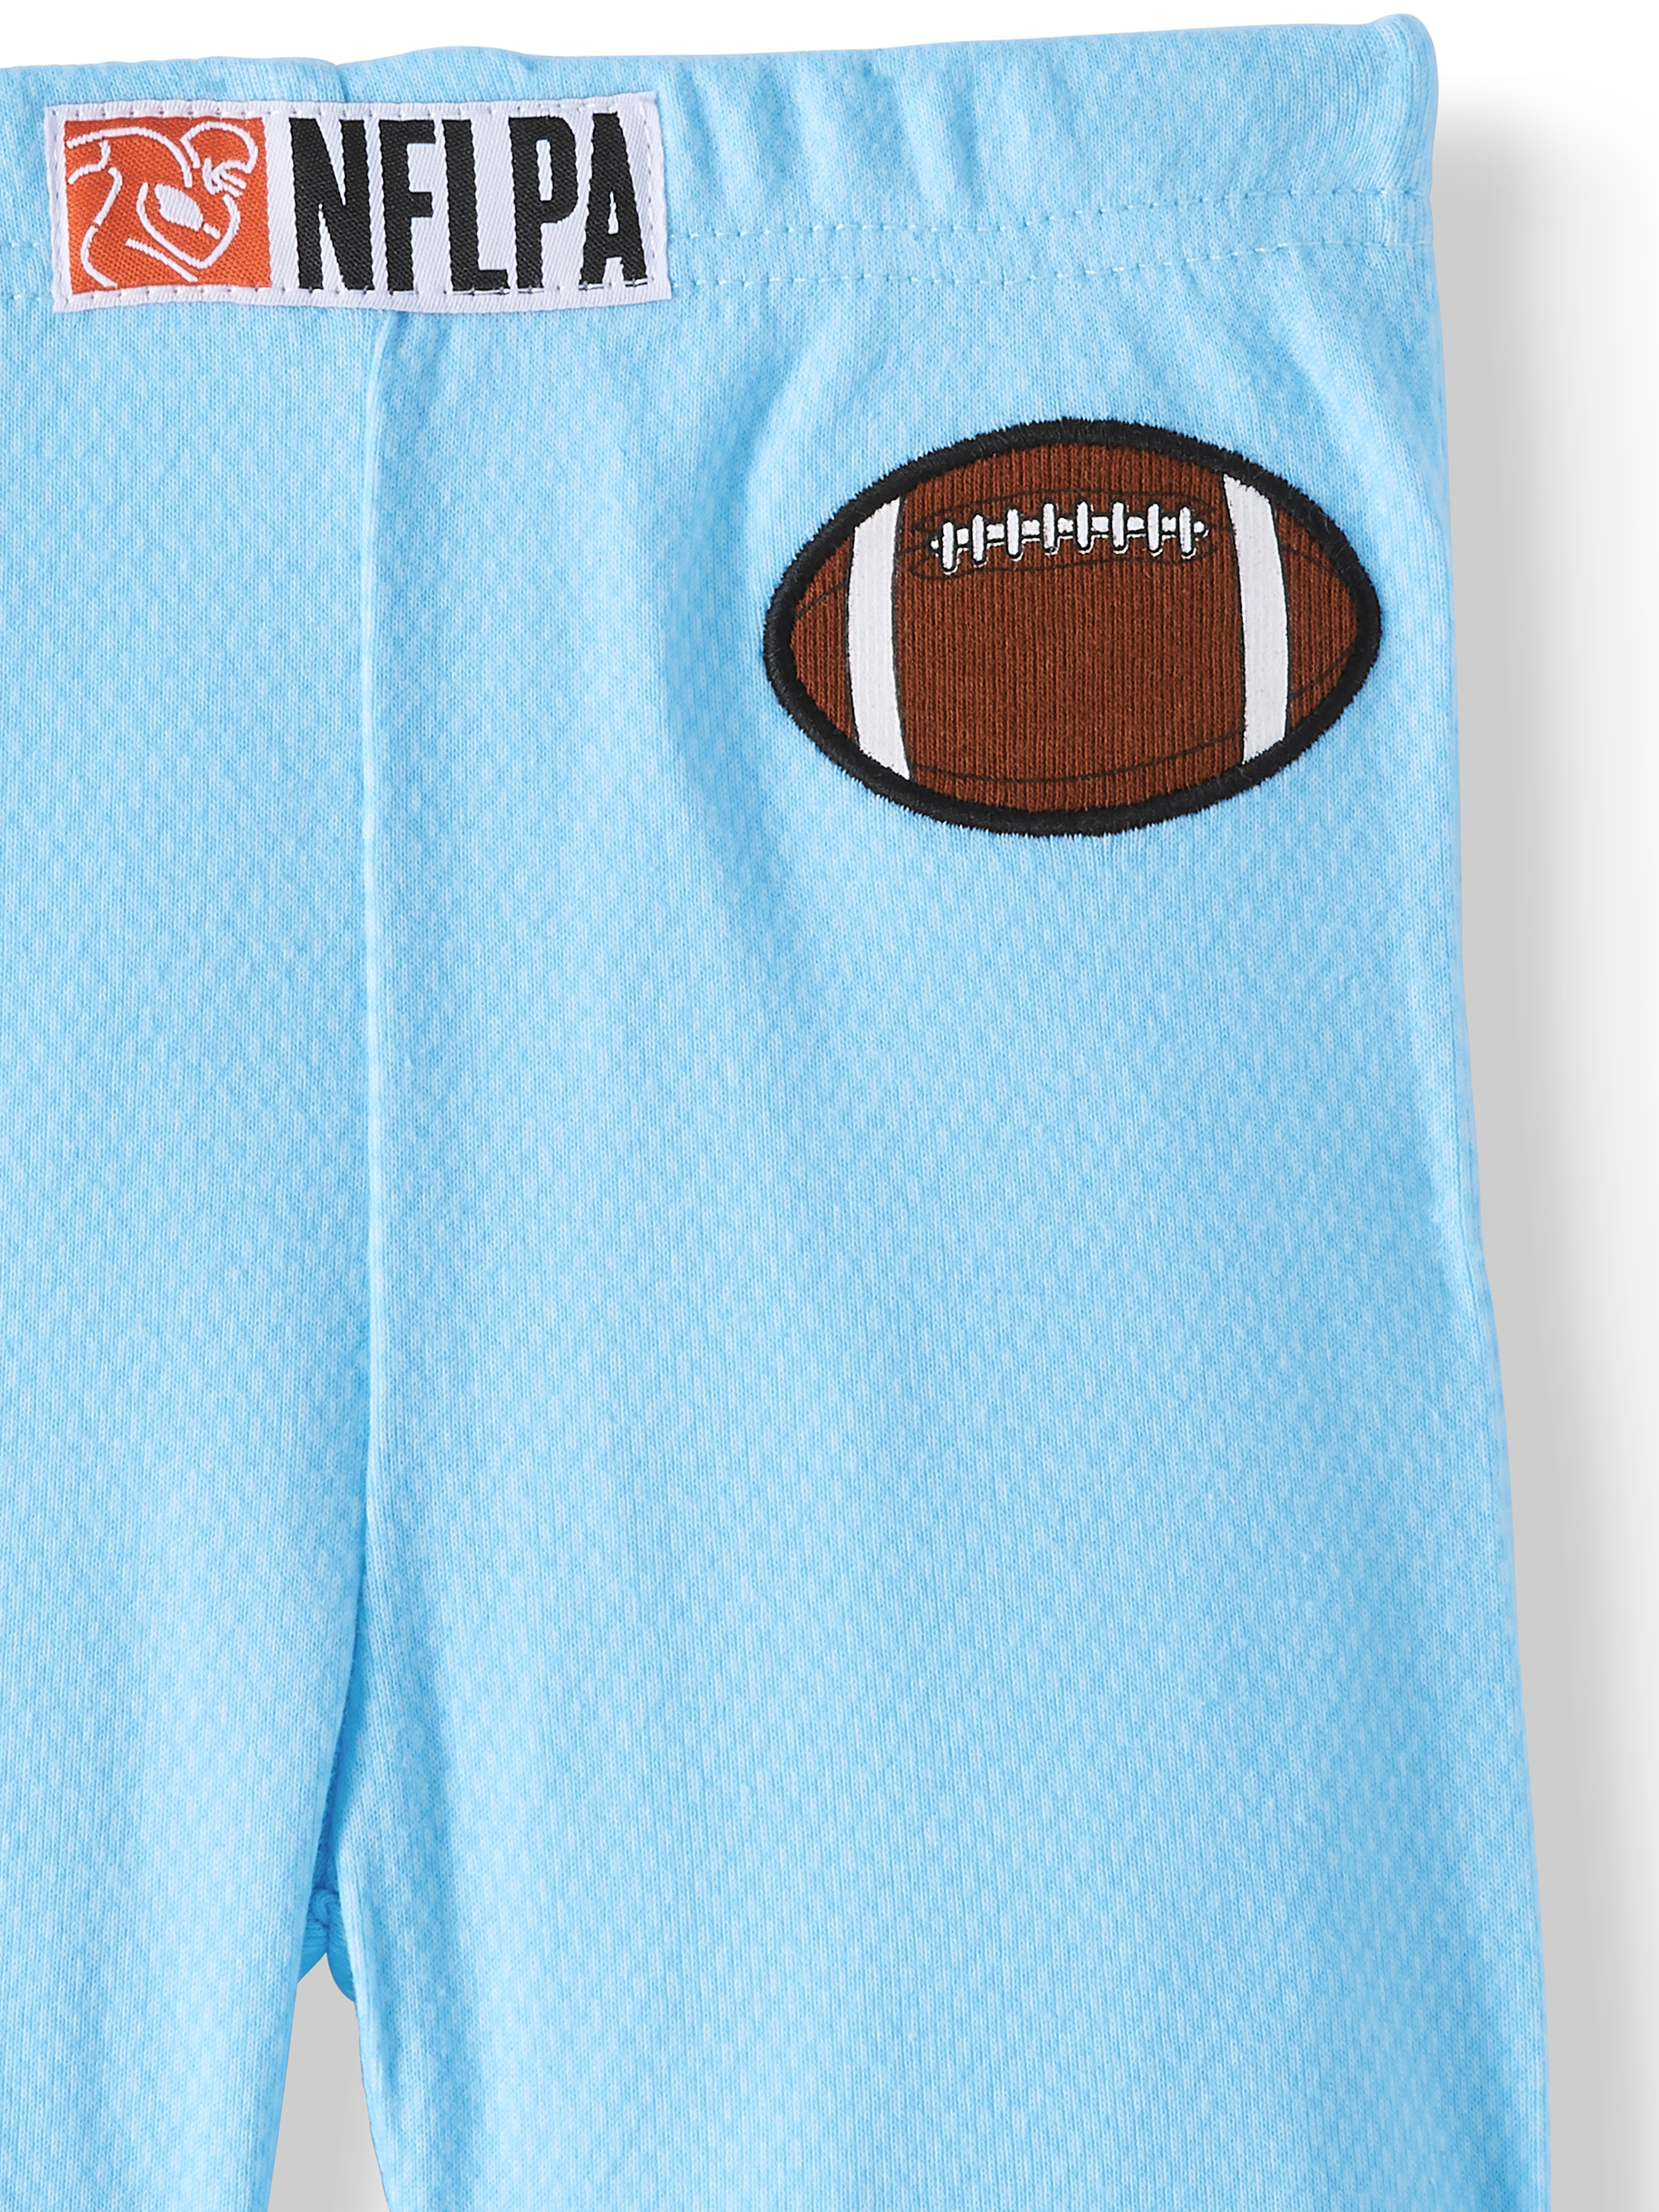 1d4fa768fc9 Komar Kids - Dallas Cowboys Ezekiel Elliott and Dak Prescott Pajamas -  Walmart.com